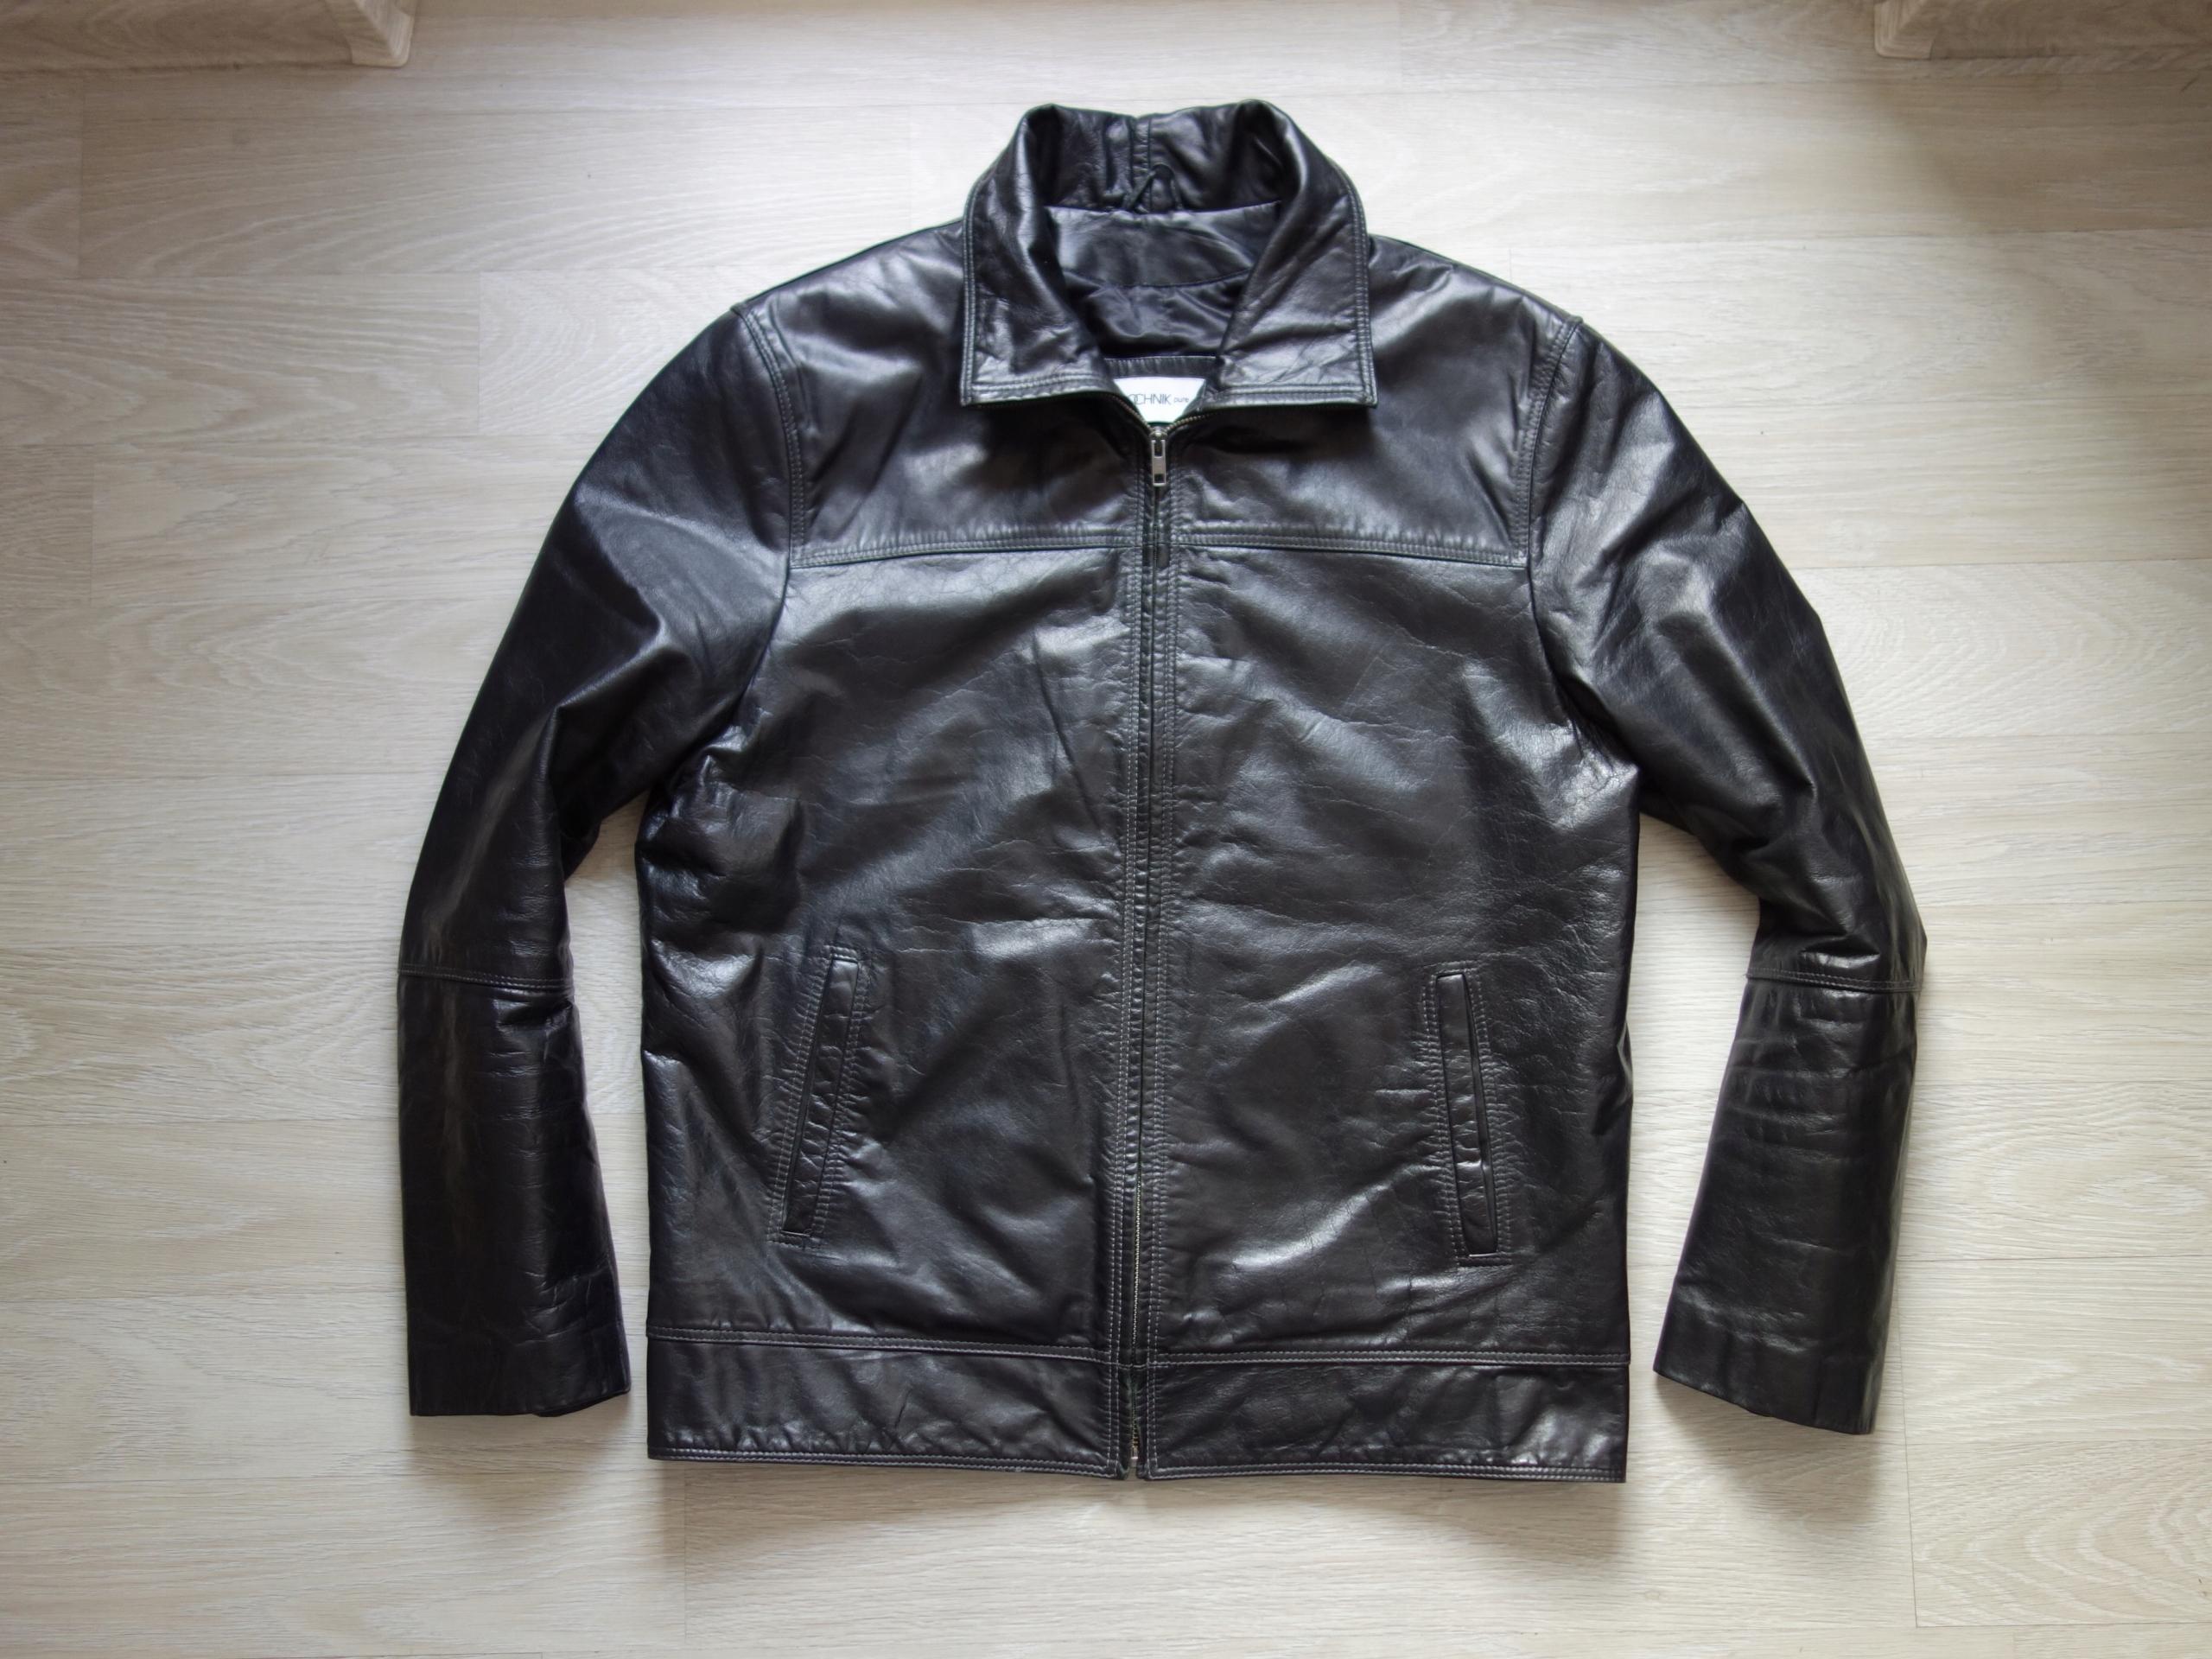 OCHNIK Pure Klasyczna kurtka męka skórzana M L